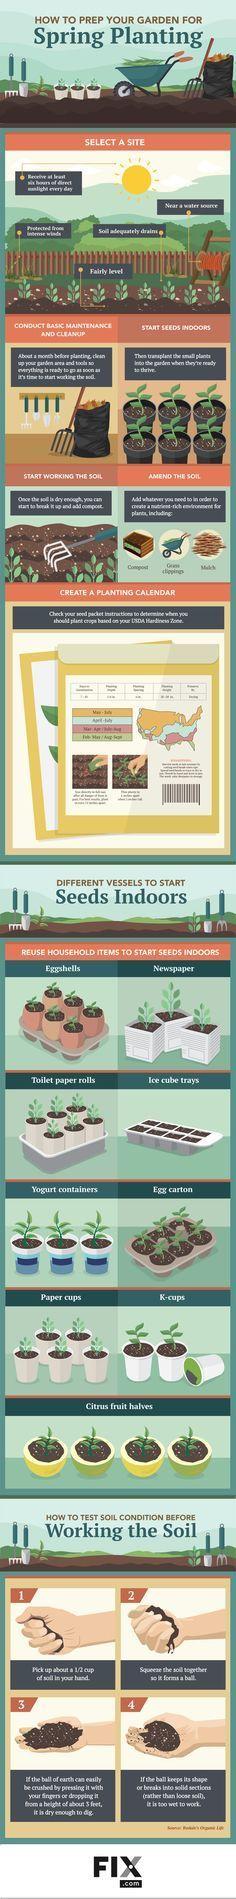 How to Start a Food Garden